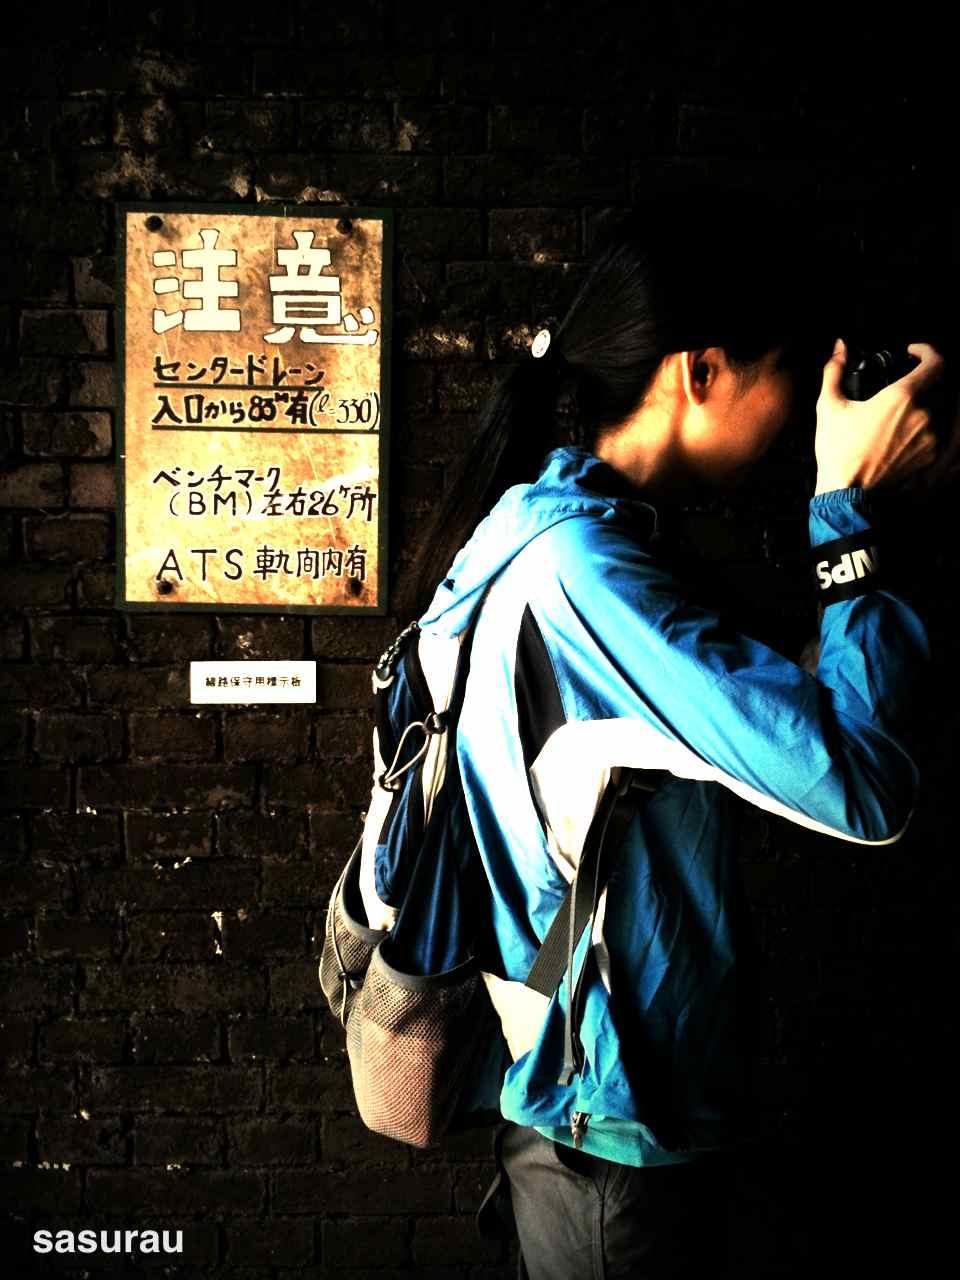 3294839-photo_by_camerakit.jpg